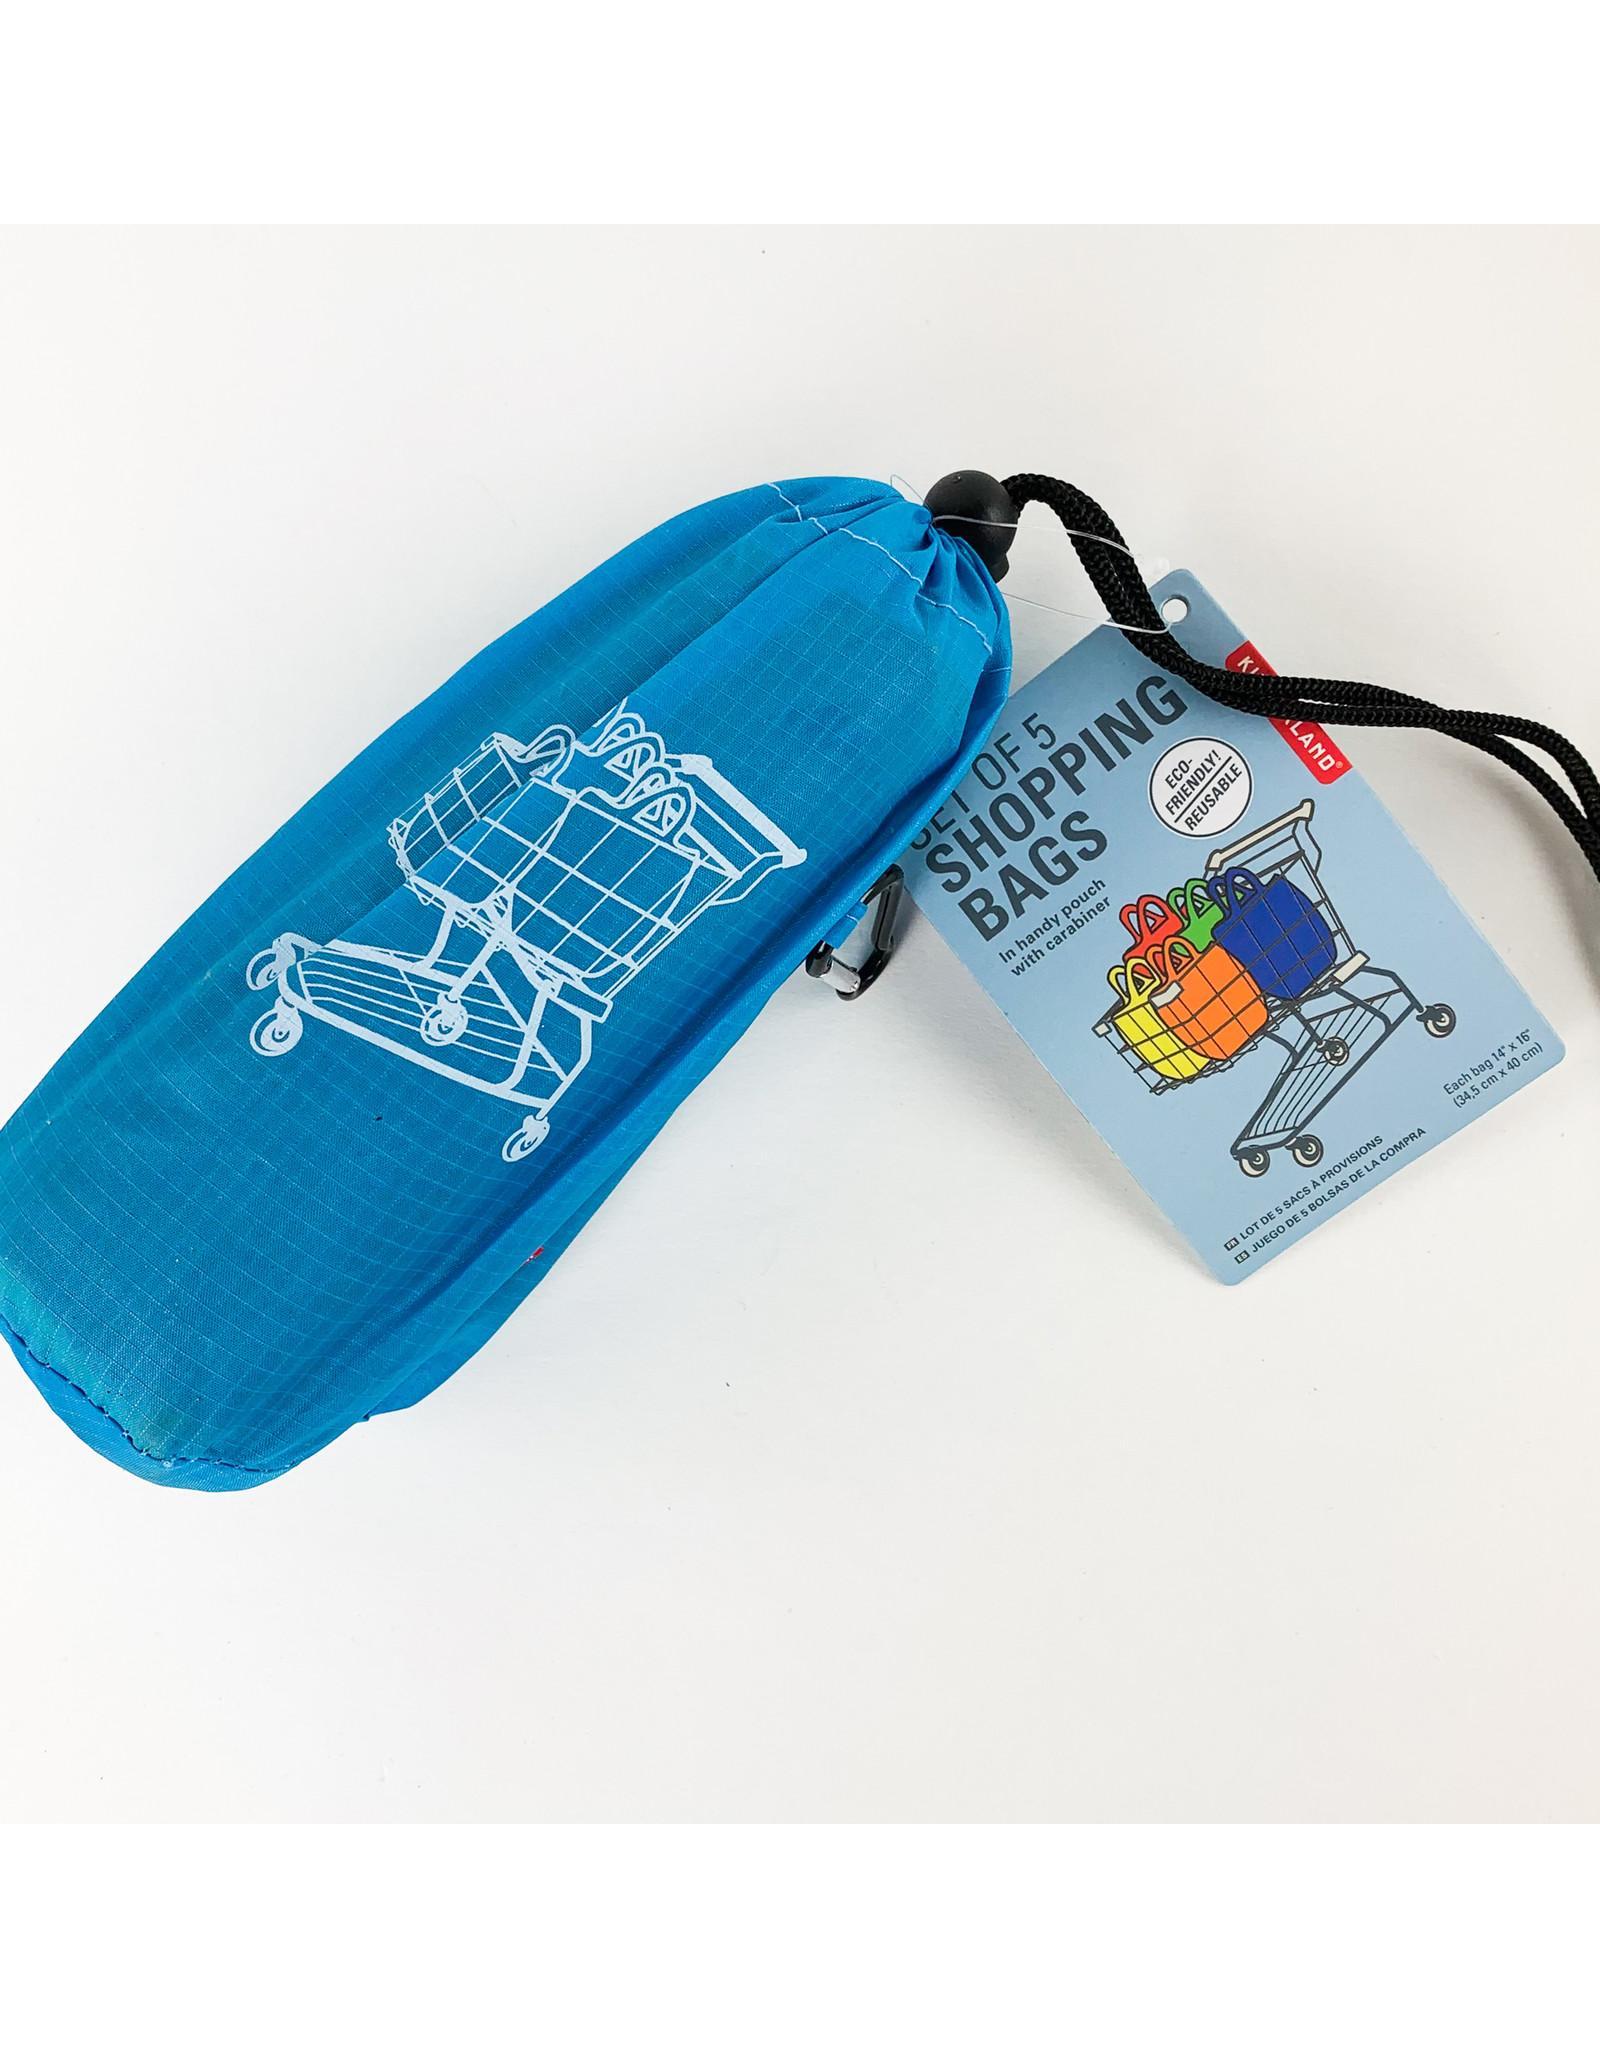 Kikkerland Set of 5 Shopping Bags